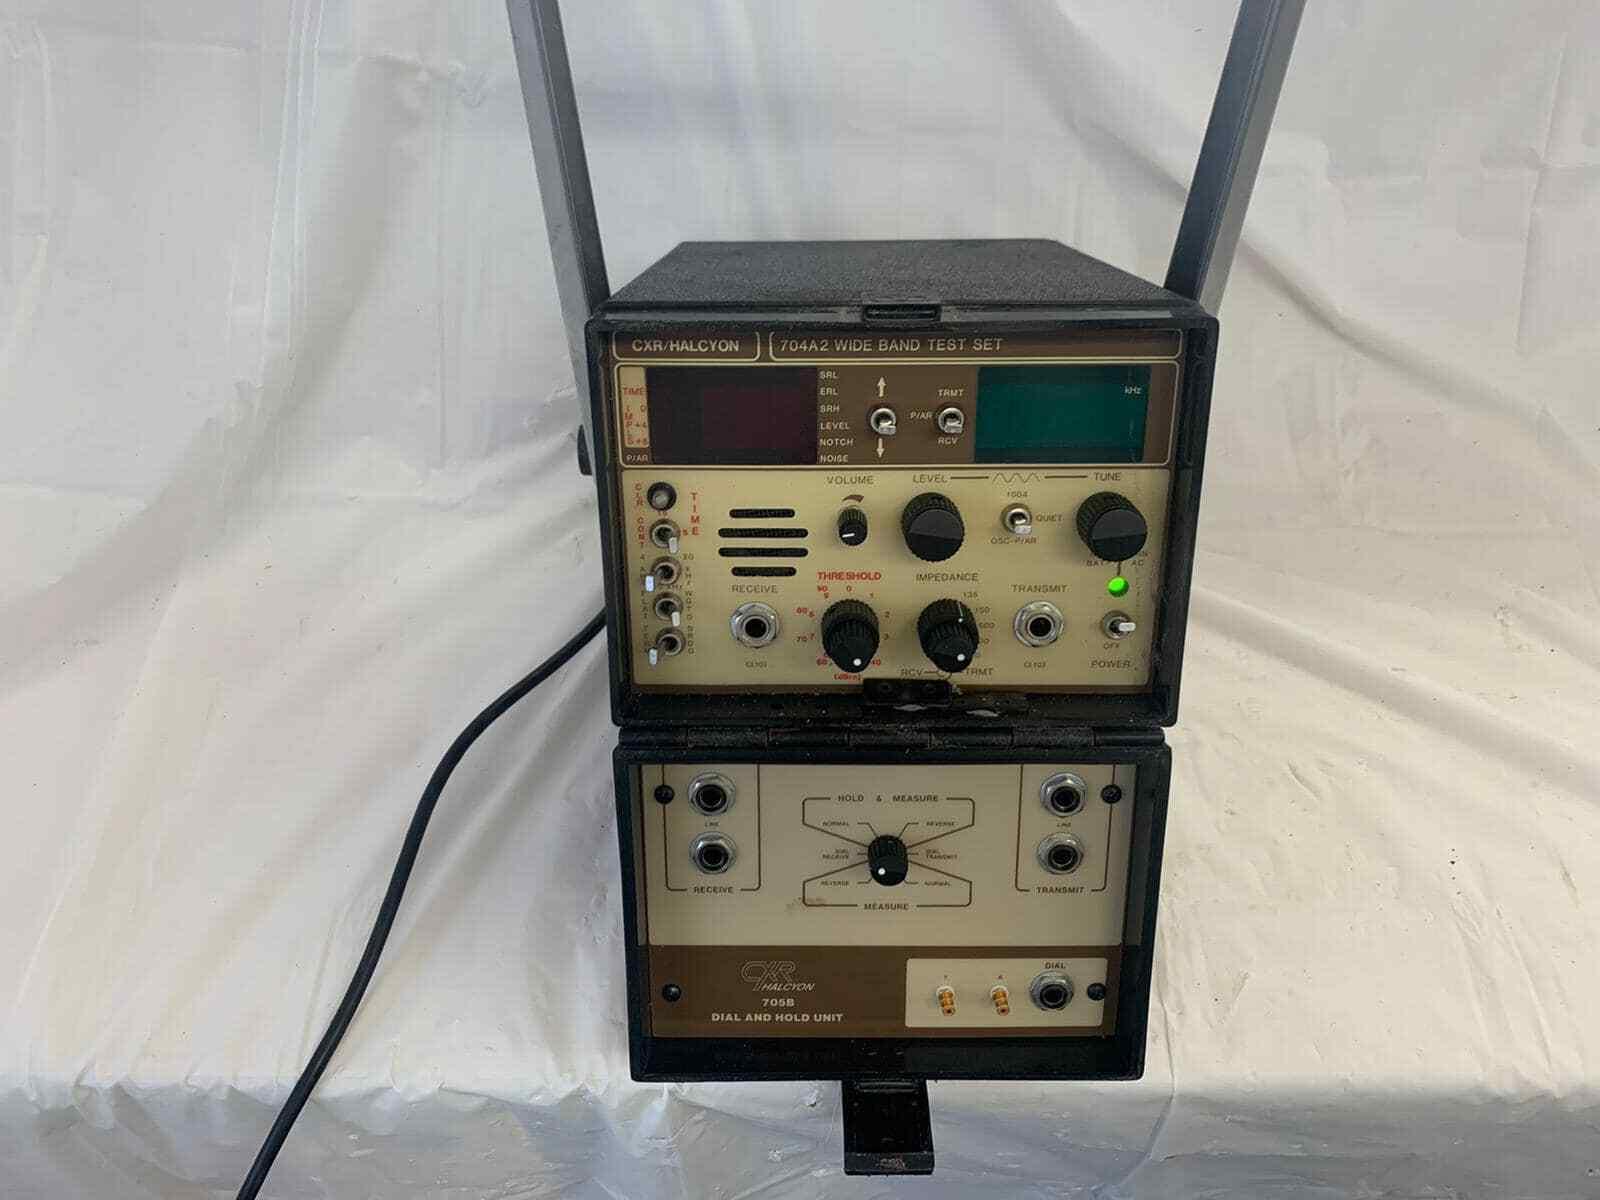 CXR Halcyon 704A2 Wide Band Test Set